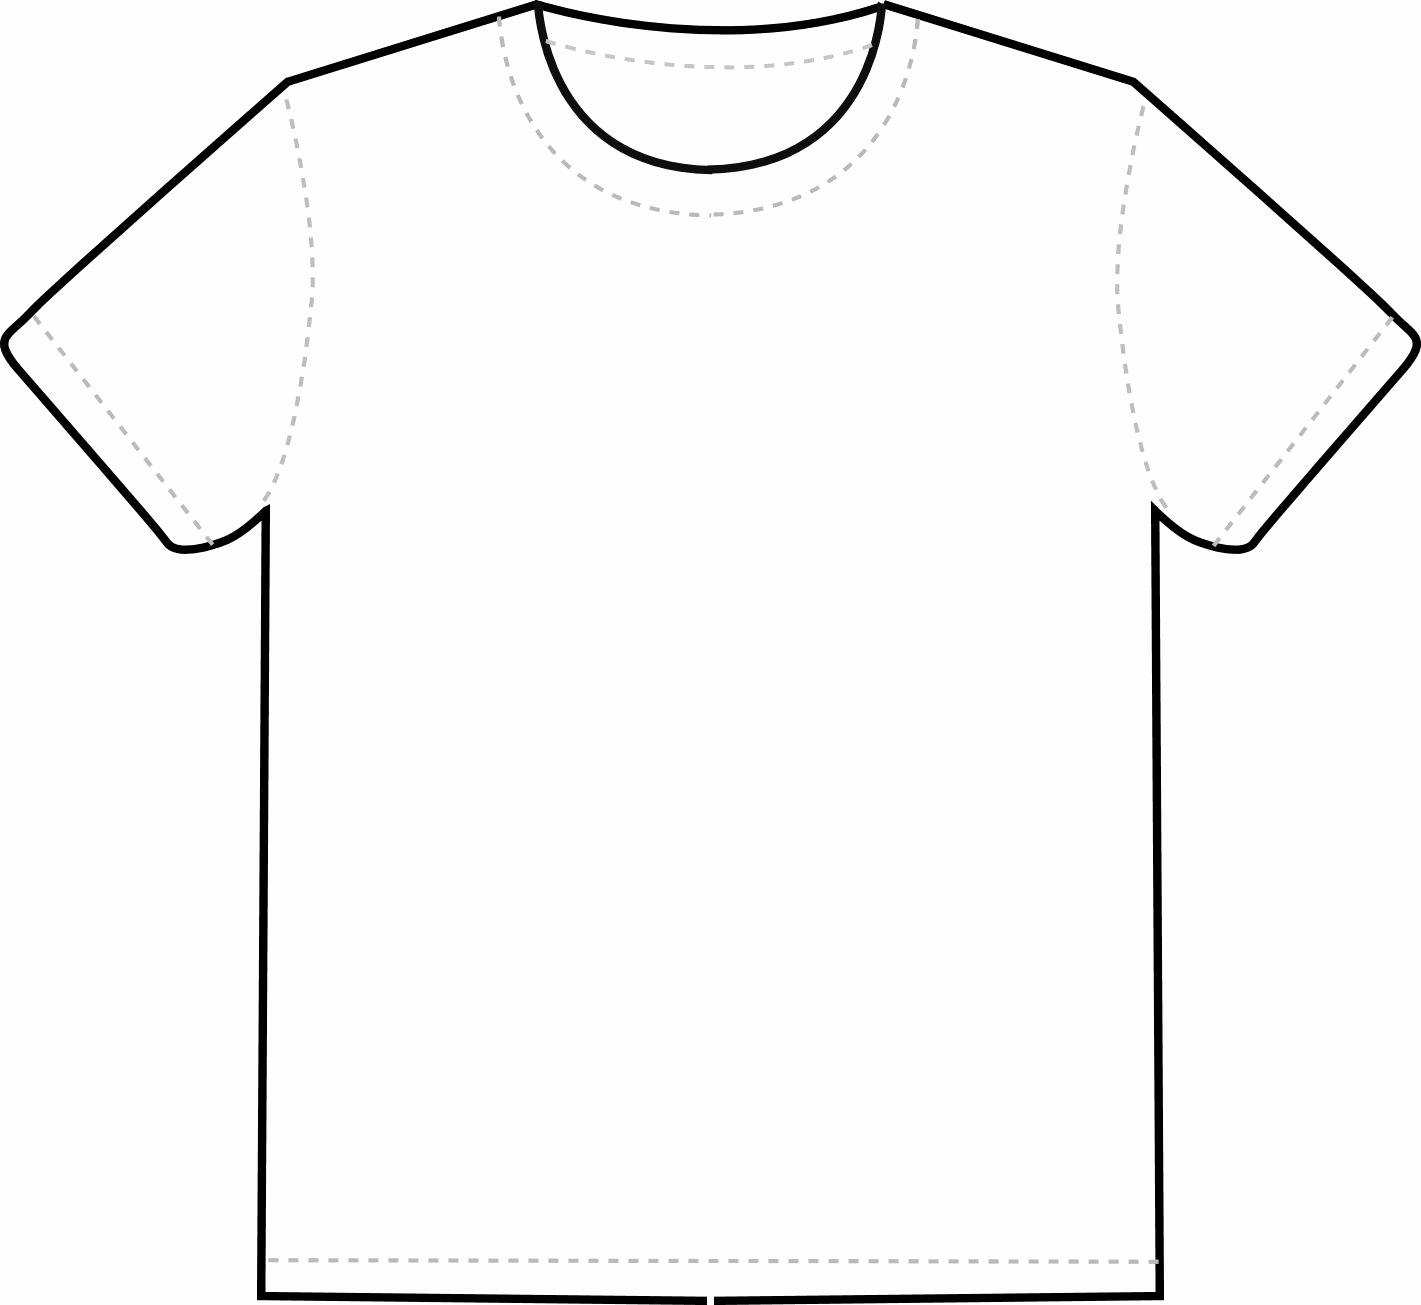 Free T Shirt Template Beautiful T Shirt Outline Clipart Clipart Best Clipart Best